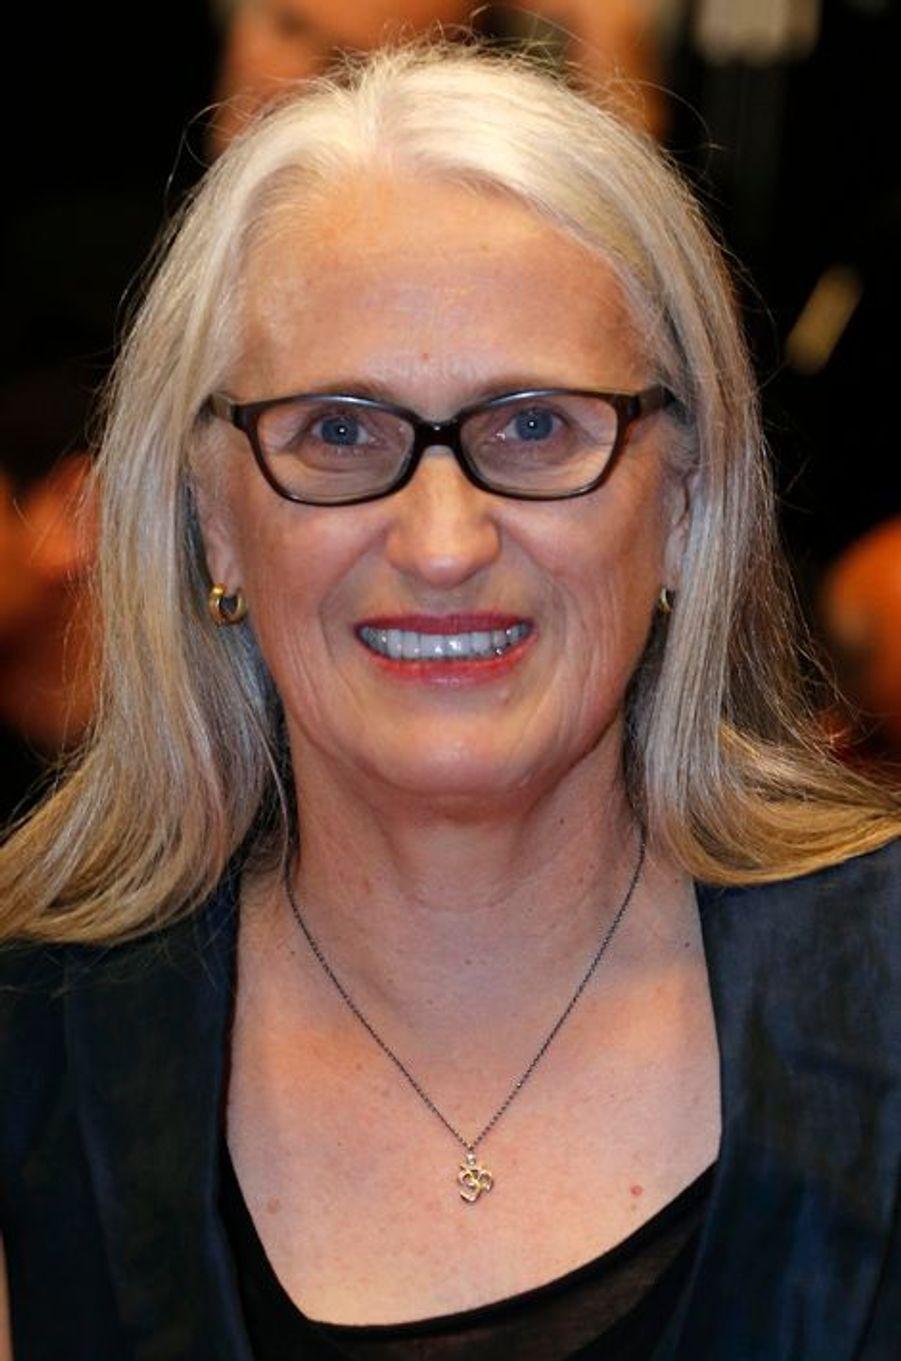 Jane Campion, réalisatrice (Nouvelle-Zélande), présidente du jury